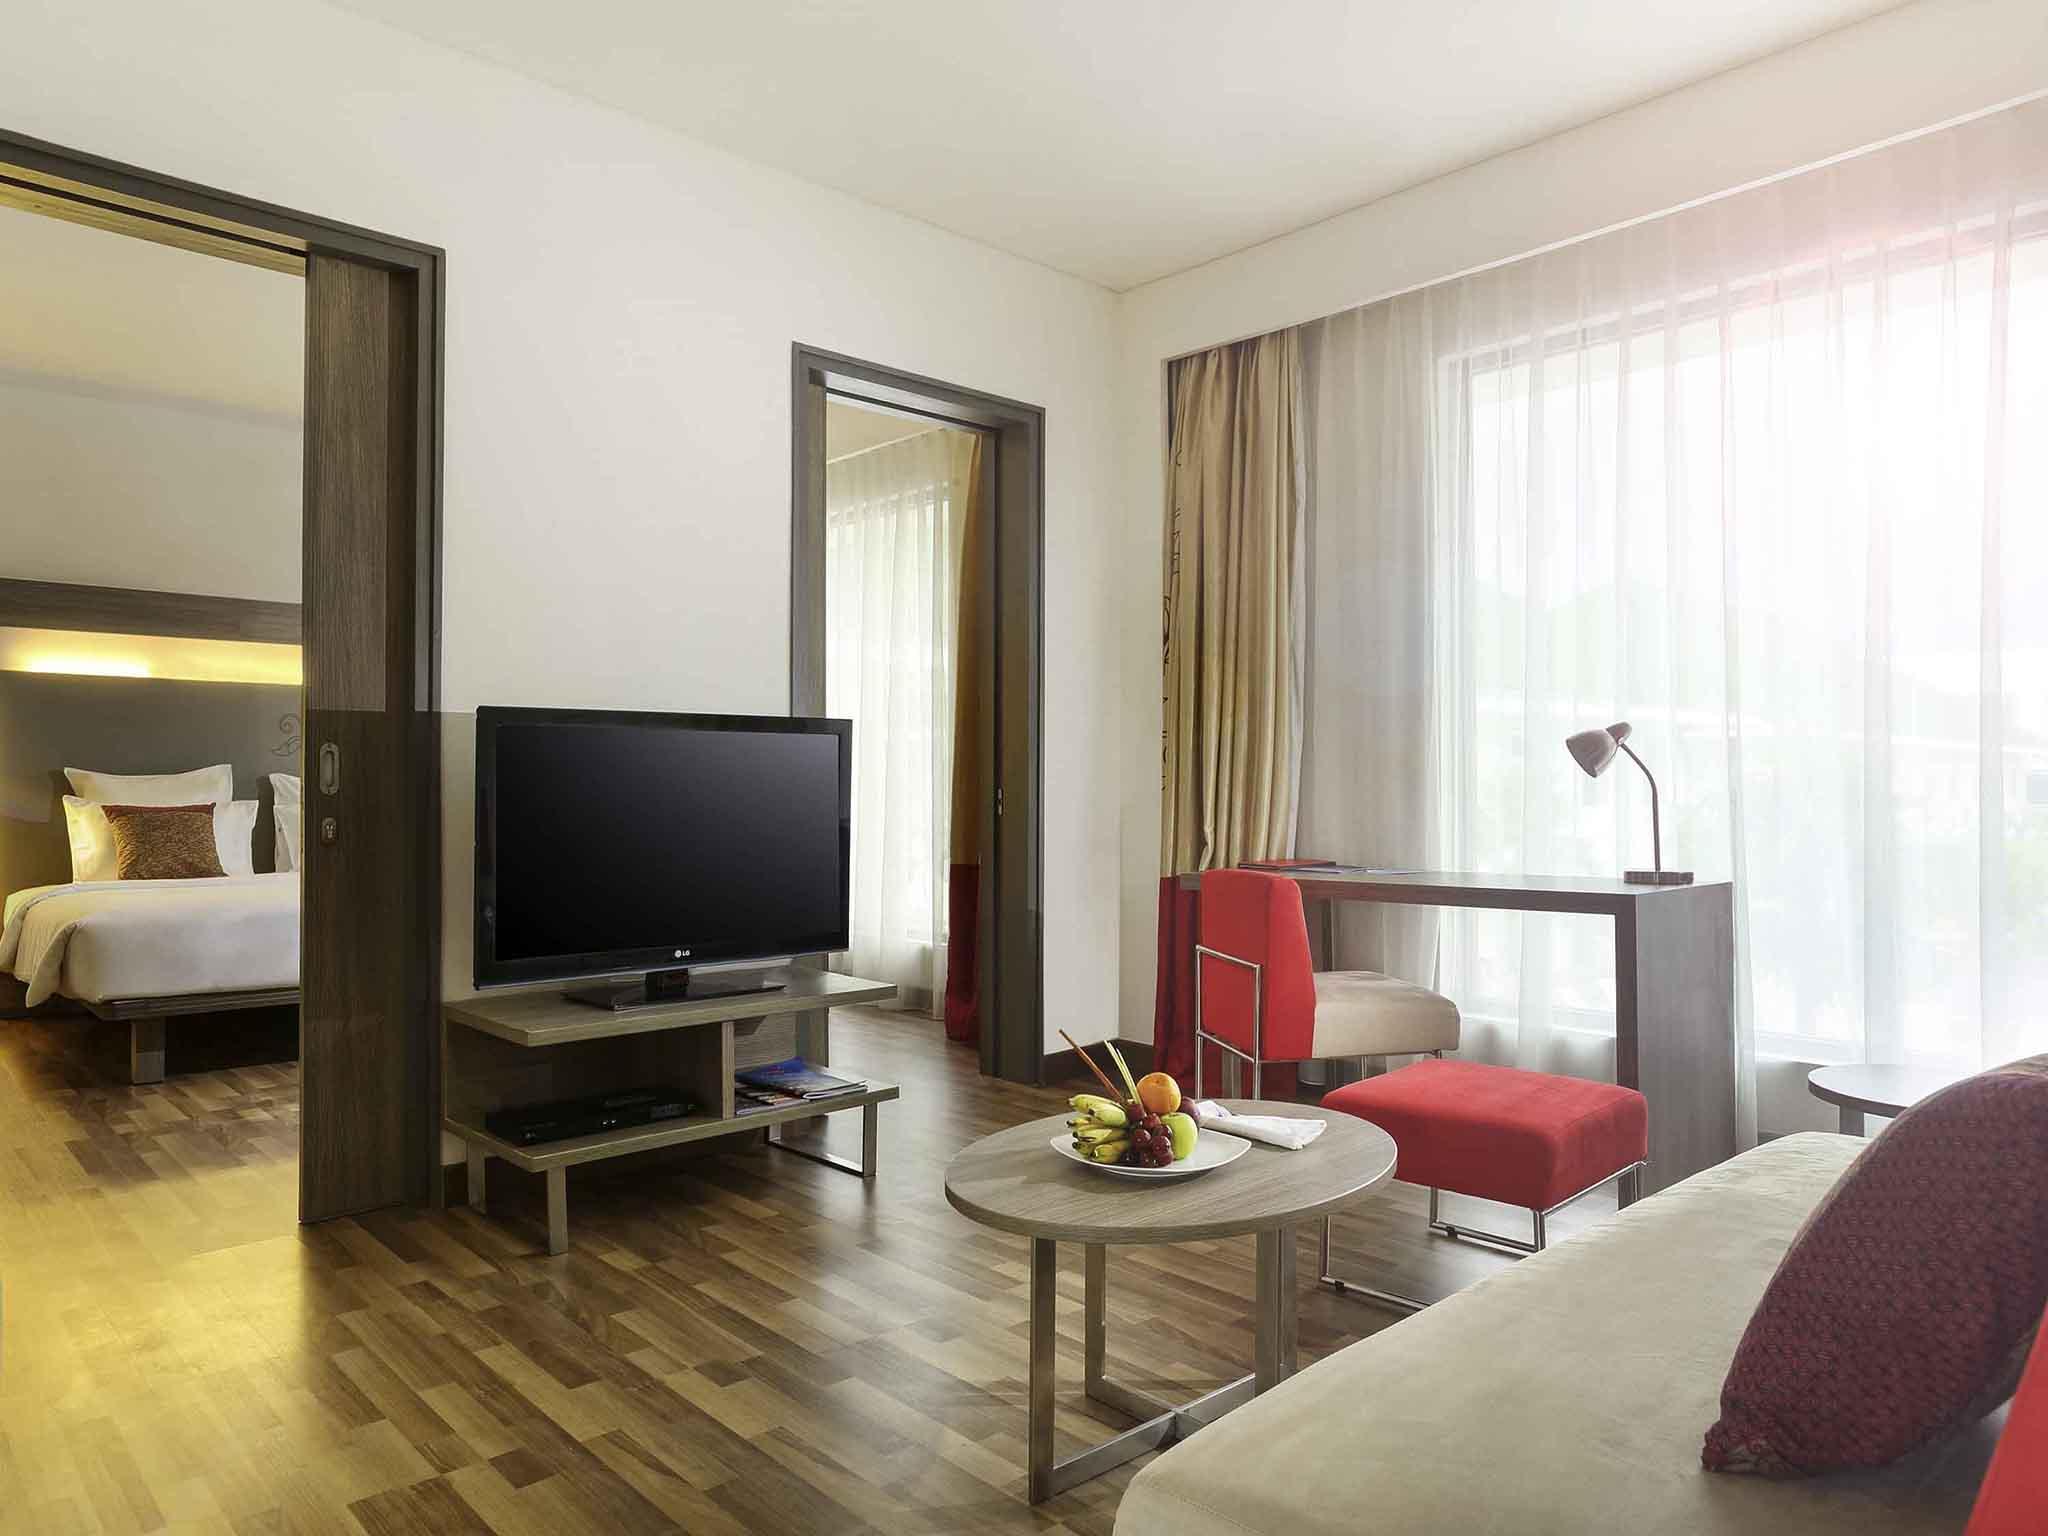 Hotel In Banjarmasin Novotel Airport Paket Murmer Acces Point Komplit Rooms